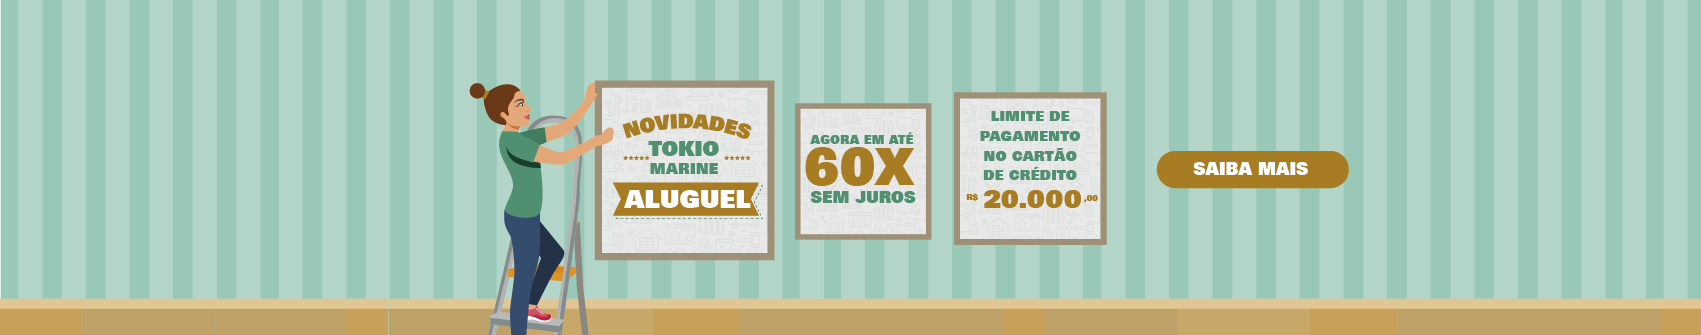 novidades-aluguel-banner-06122020v1